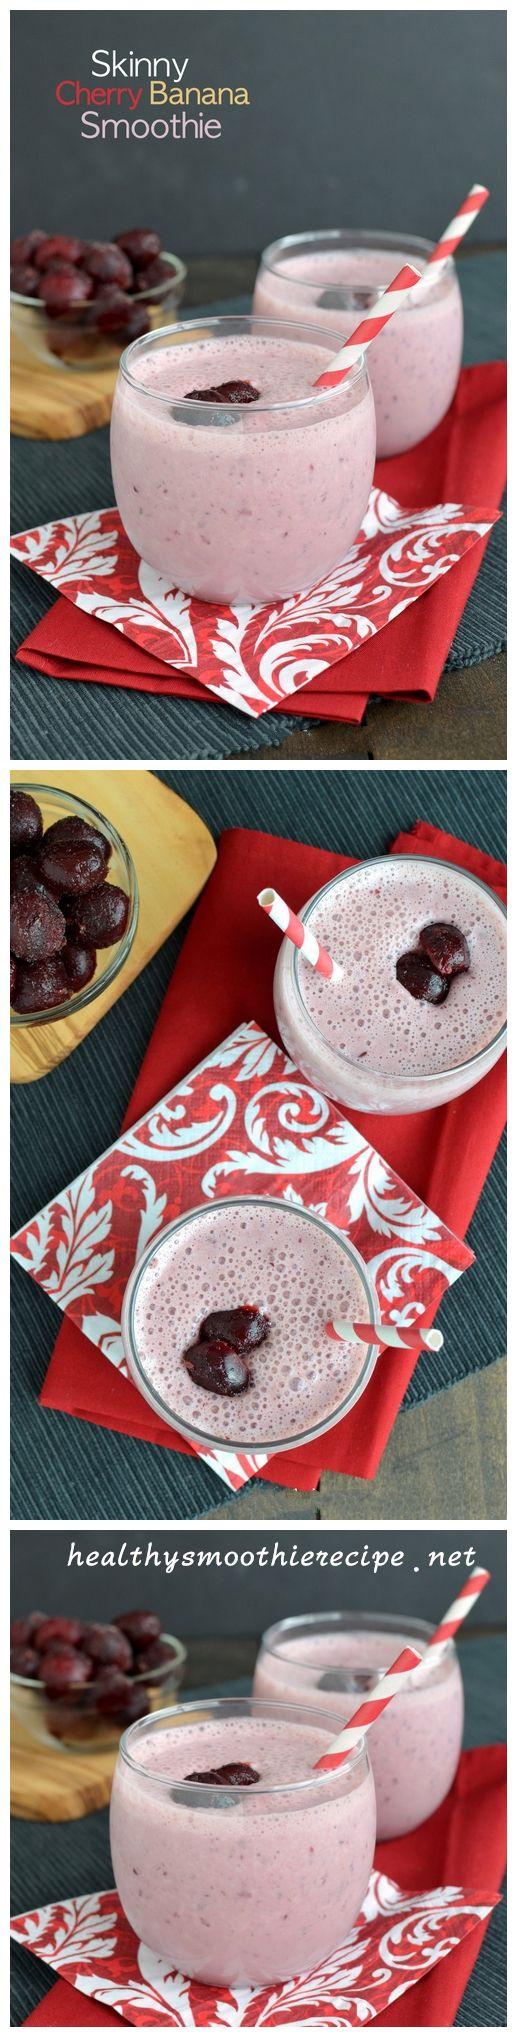 Skinny Cherry Banana #Smoothie #Recipe  1/2 cup frozen dark, sweet cherries 1 frozen banana 1/2 cup plain greek yogurt 1 cup skim milk 1 scoop vanilla protein powder